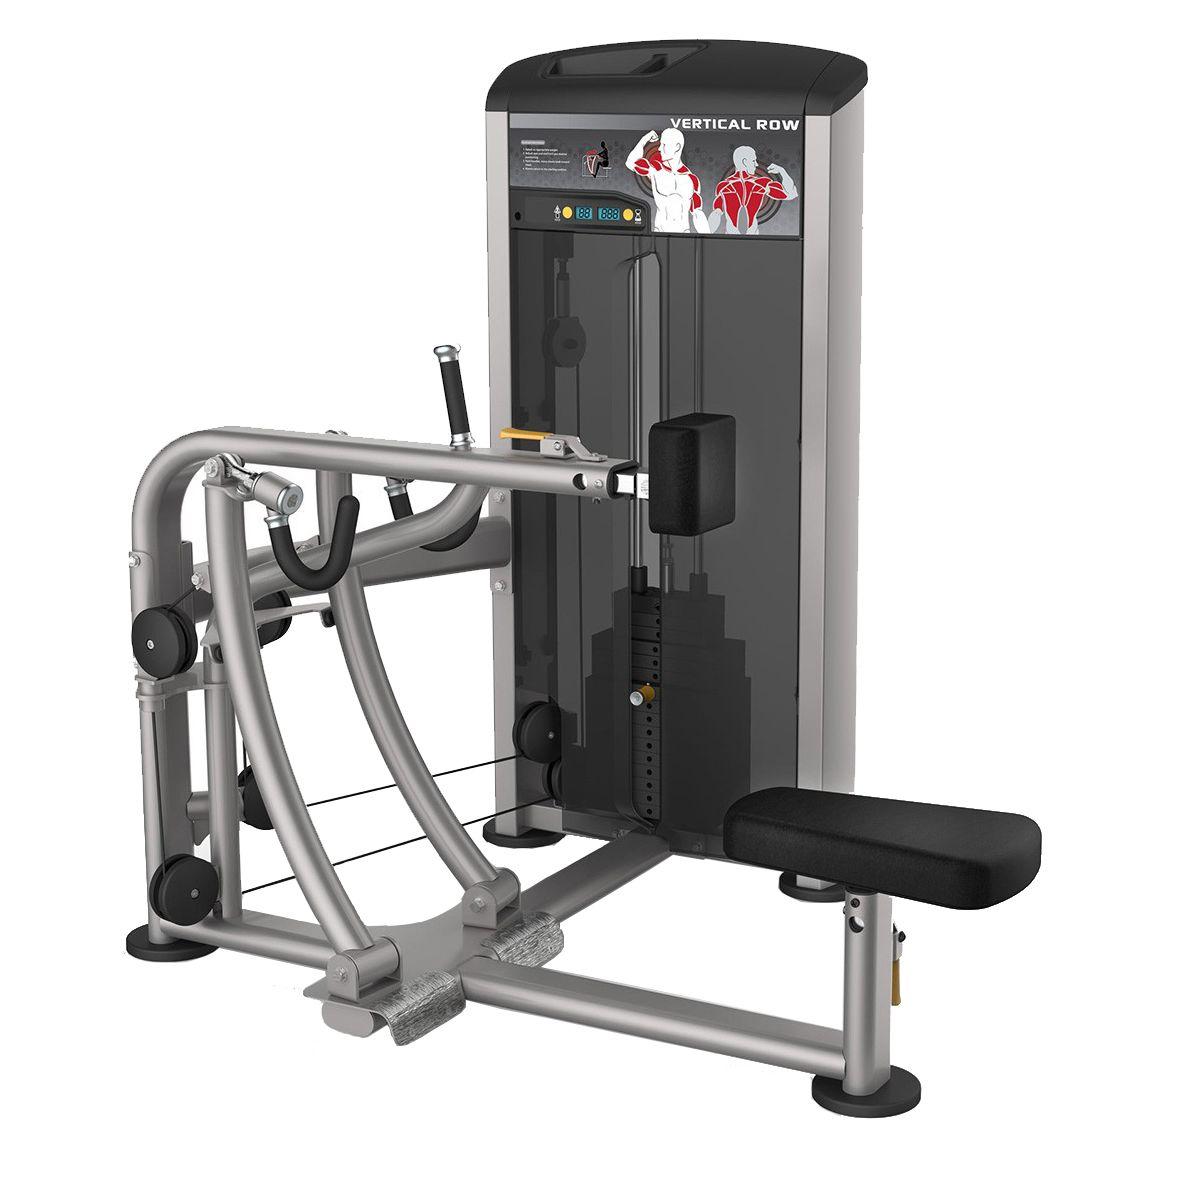 a row machine